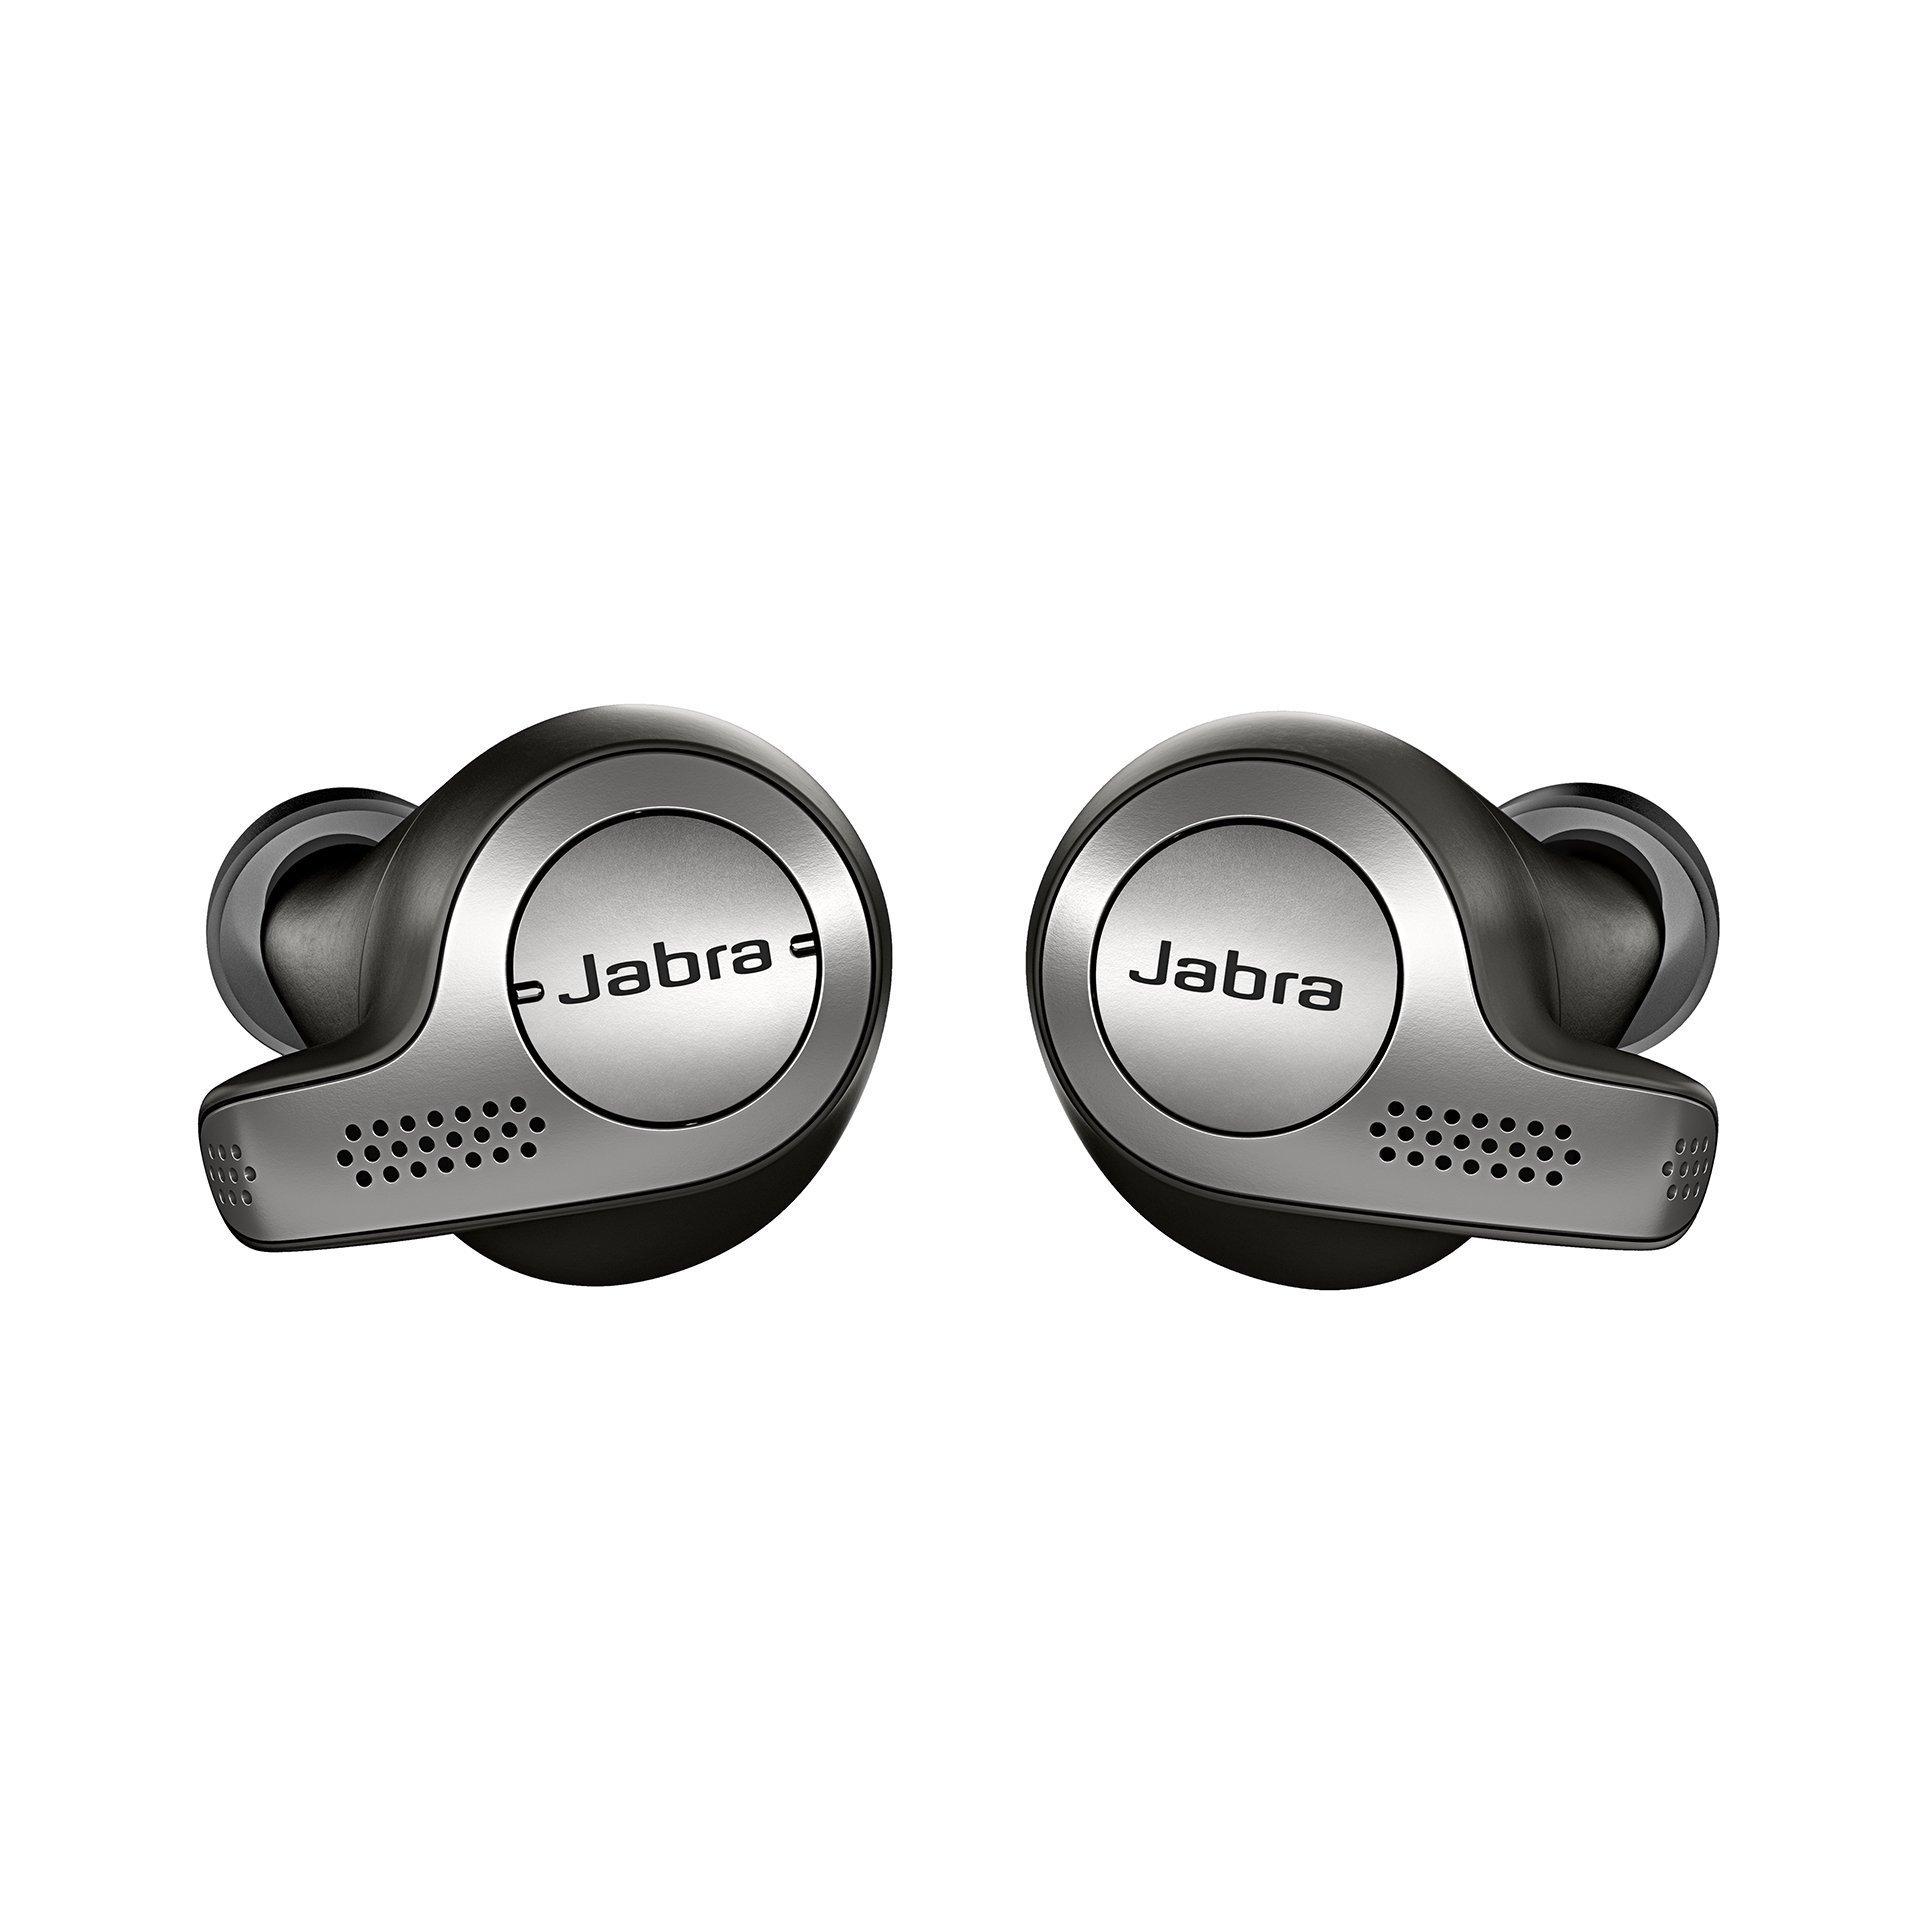 ویکالا · خرید  اصل اورجینال · خرید از آمازون · Jabra Elite 65t Alexa Enabled True Wireless Earbuds Charging Case – Titanium Black wekala · ویکالا